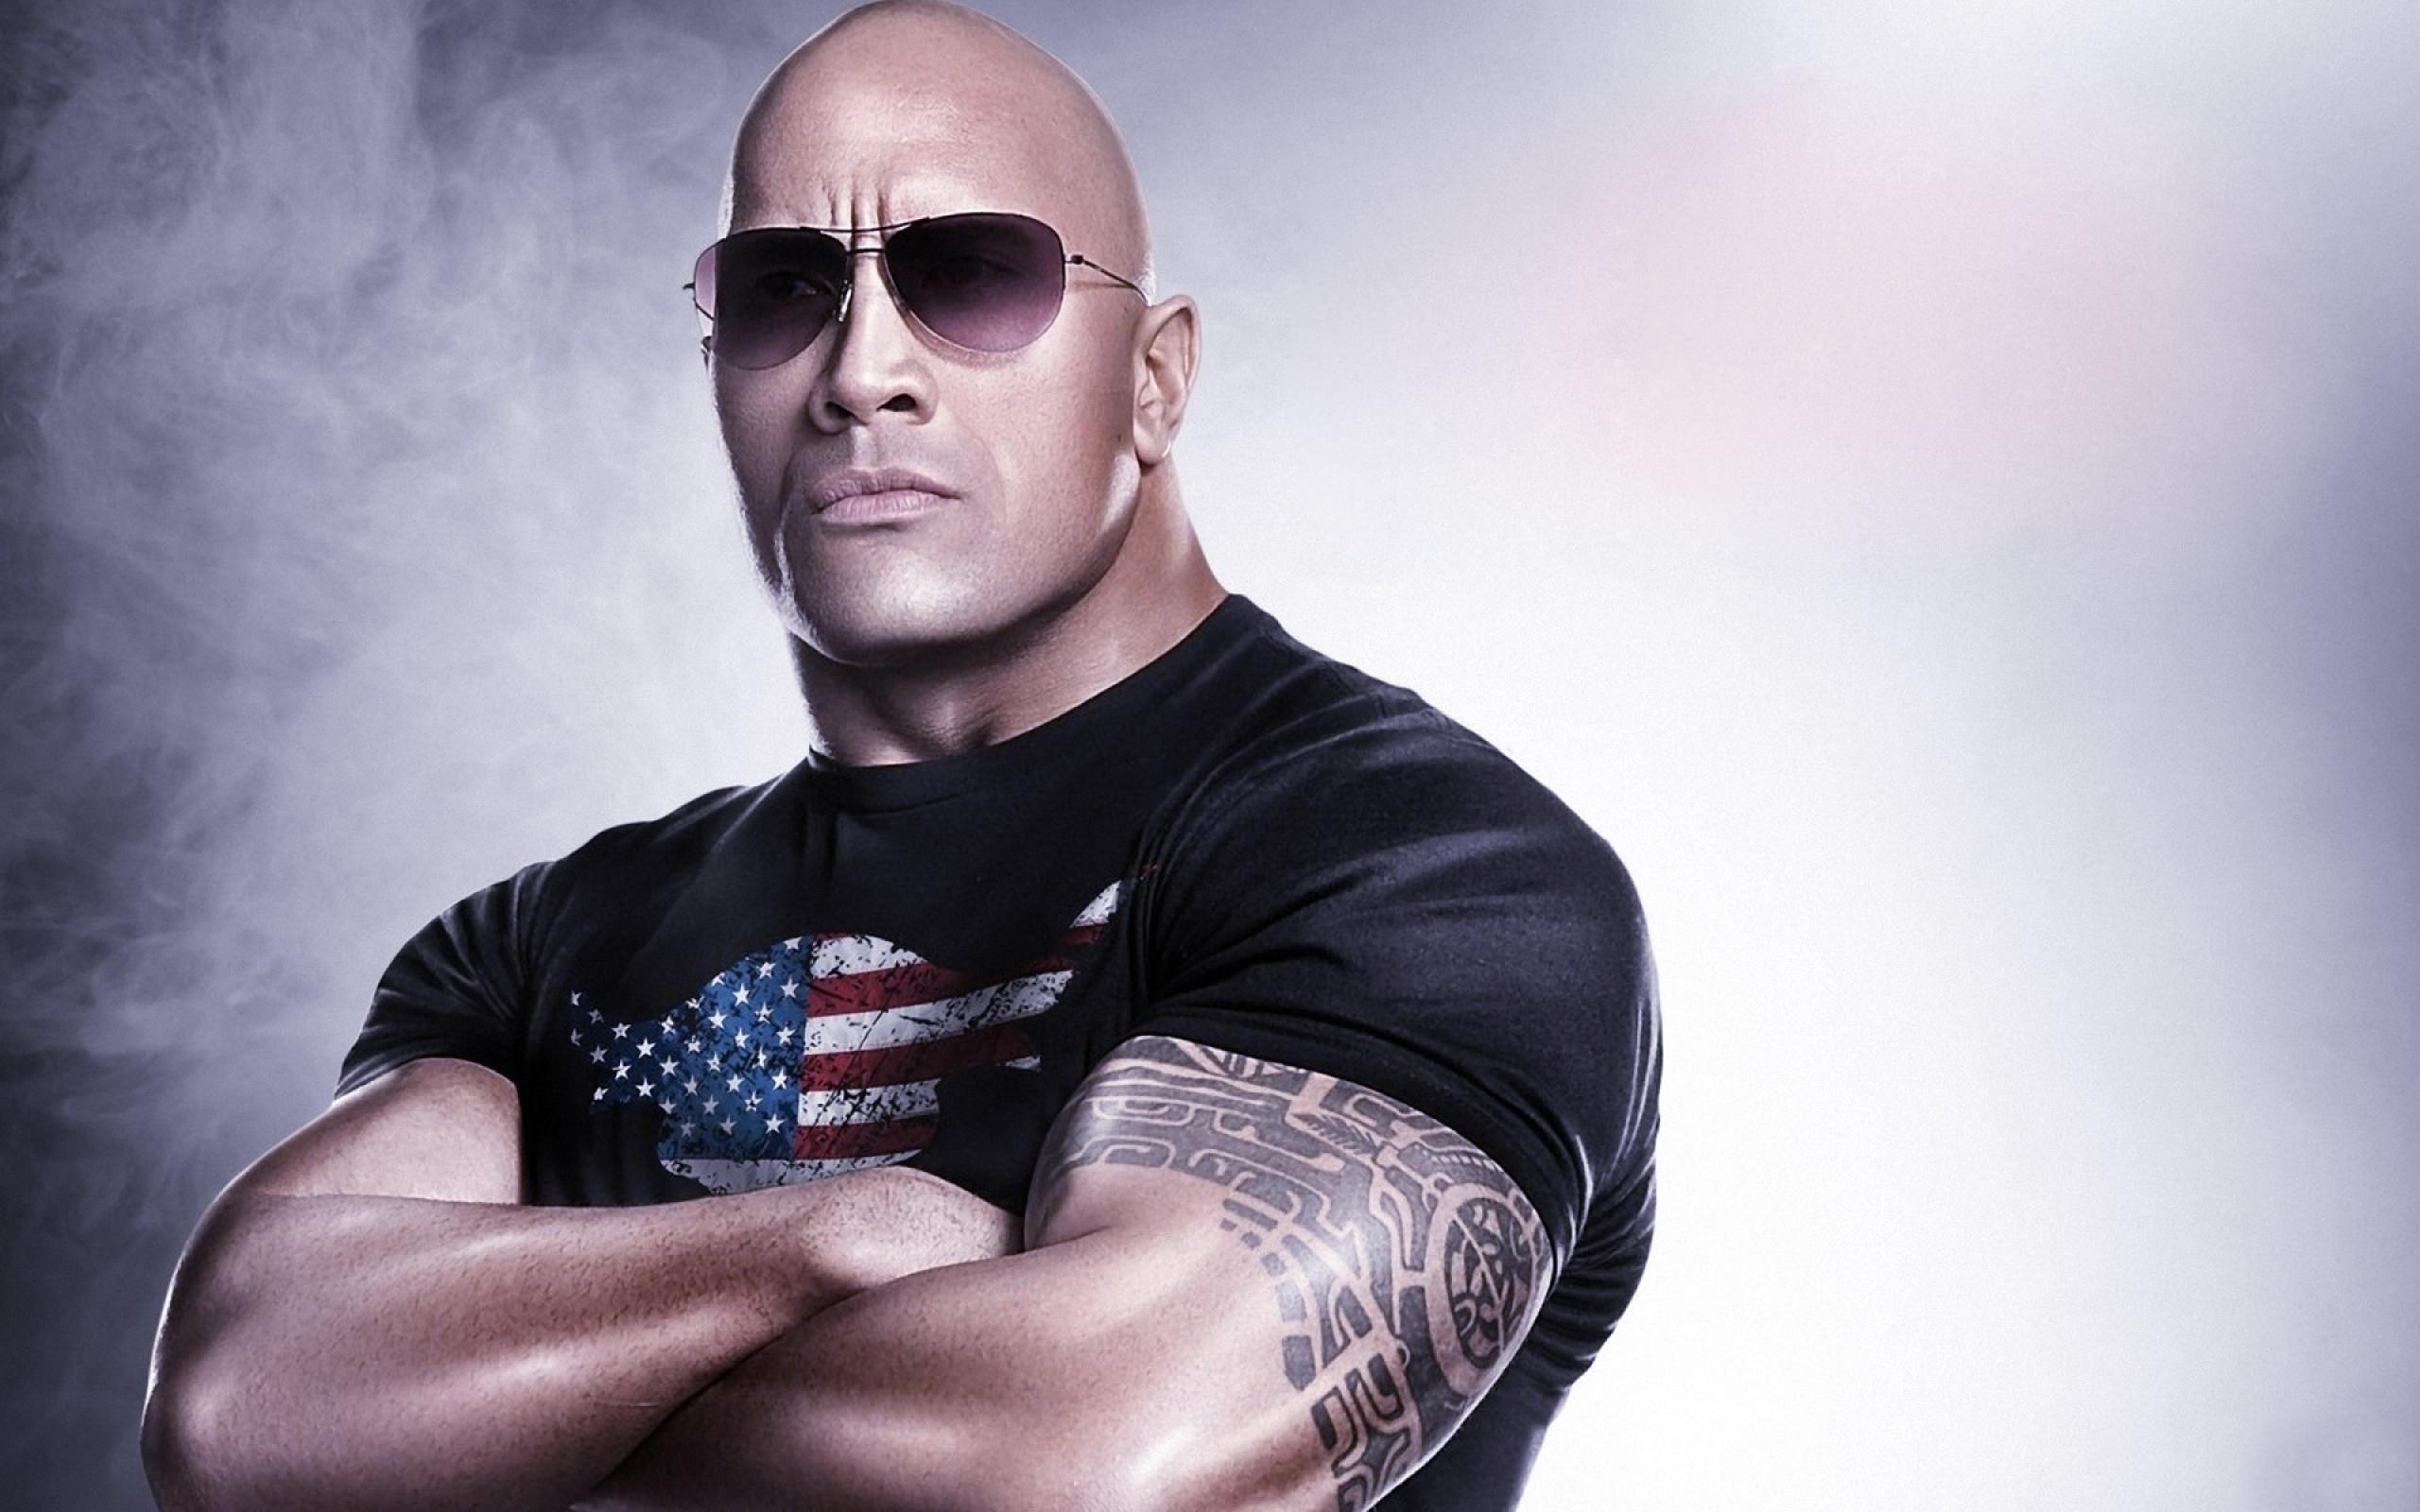 … LatestWallpaper99 WWE John Cena New HD Wallpaper | New HD Wallpapers